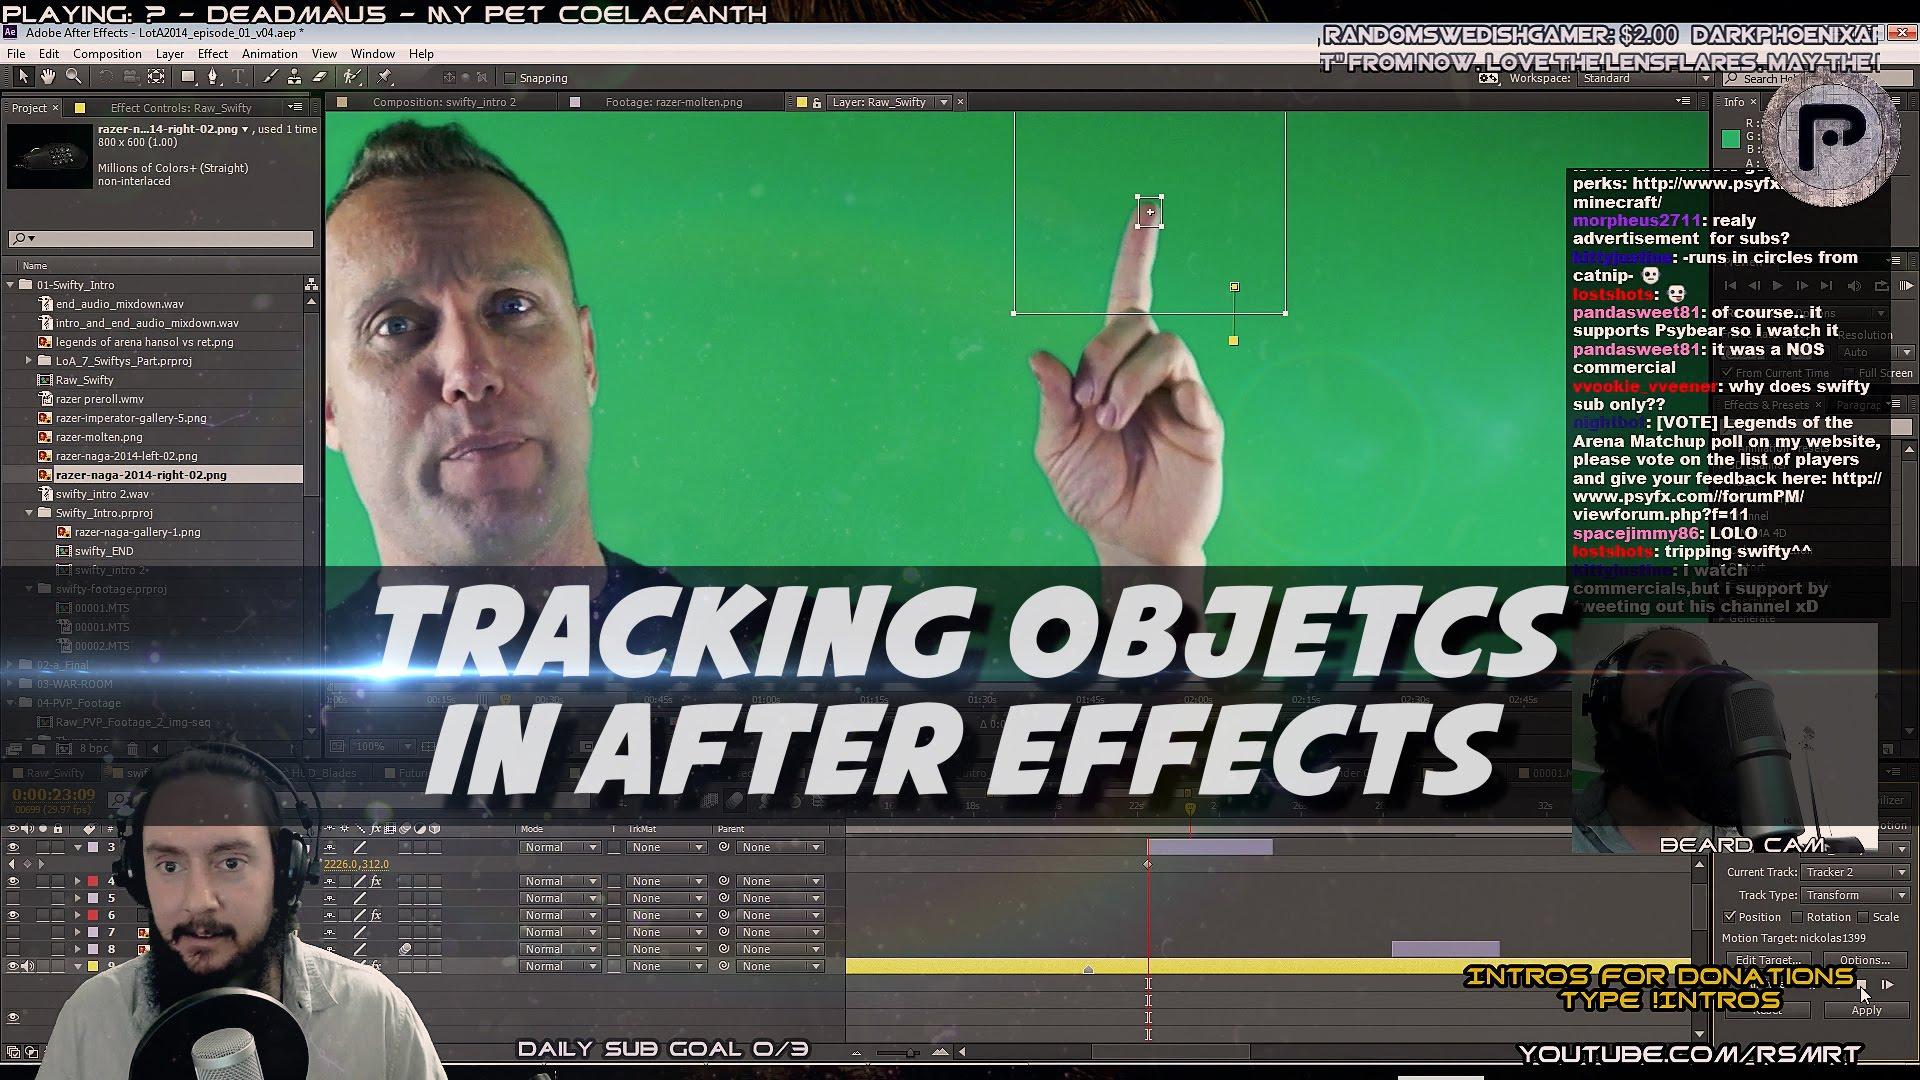 AE Motion Tracking – Razer Naga 2014 to Swifty's Finger